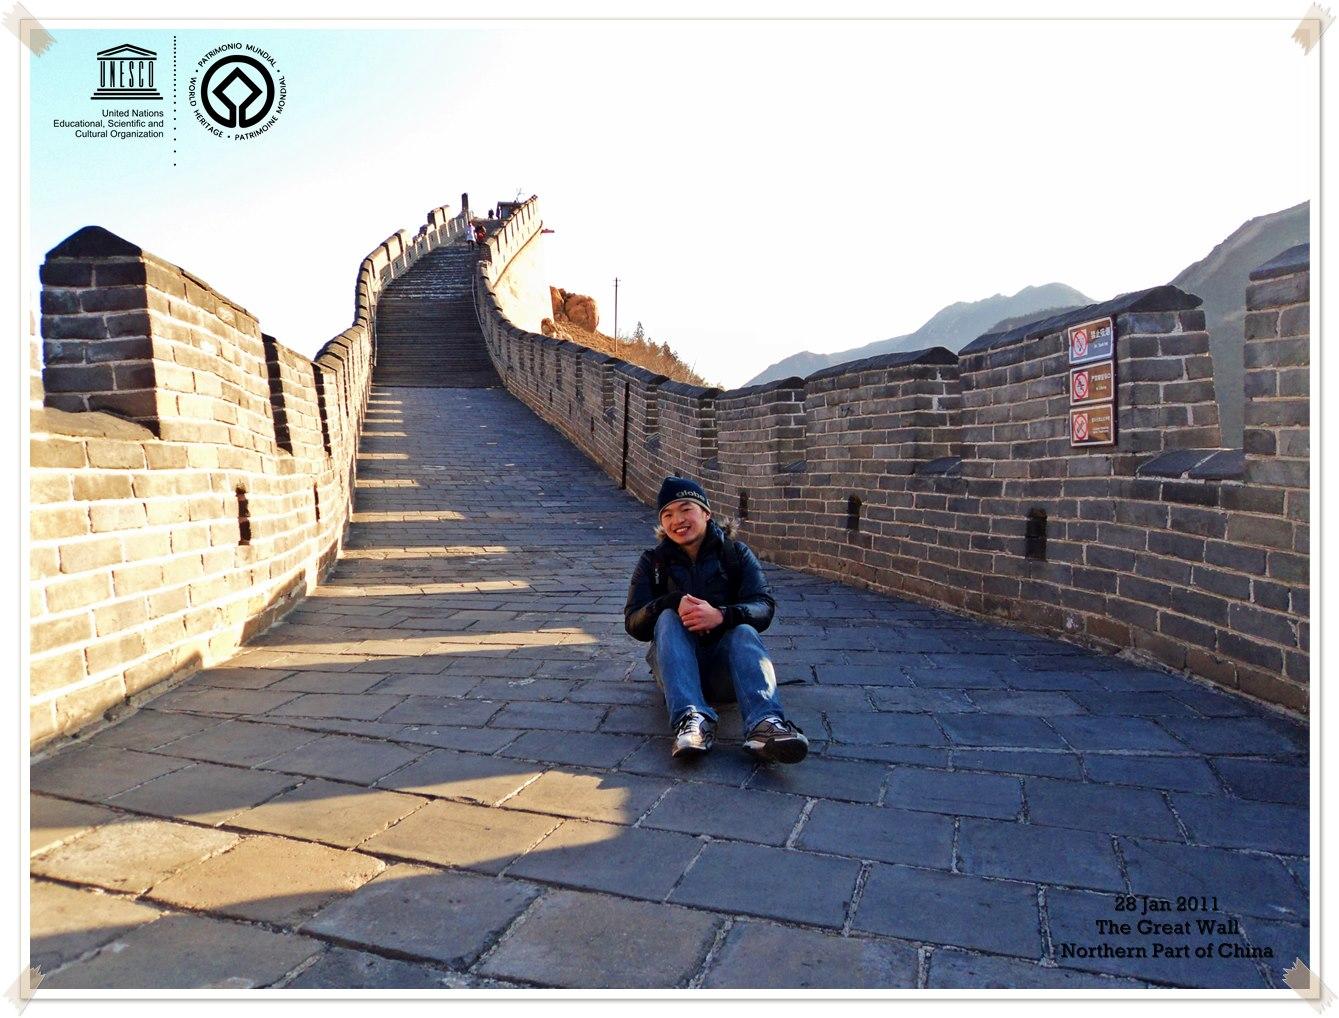 The great ... great wall The Great Wall - China Thomas shaw